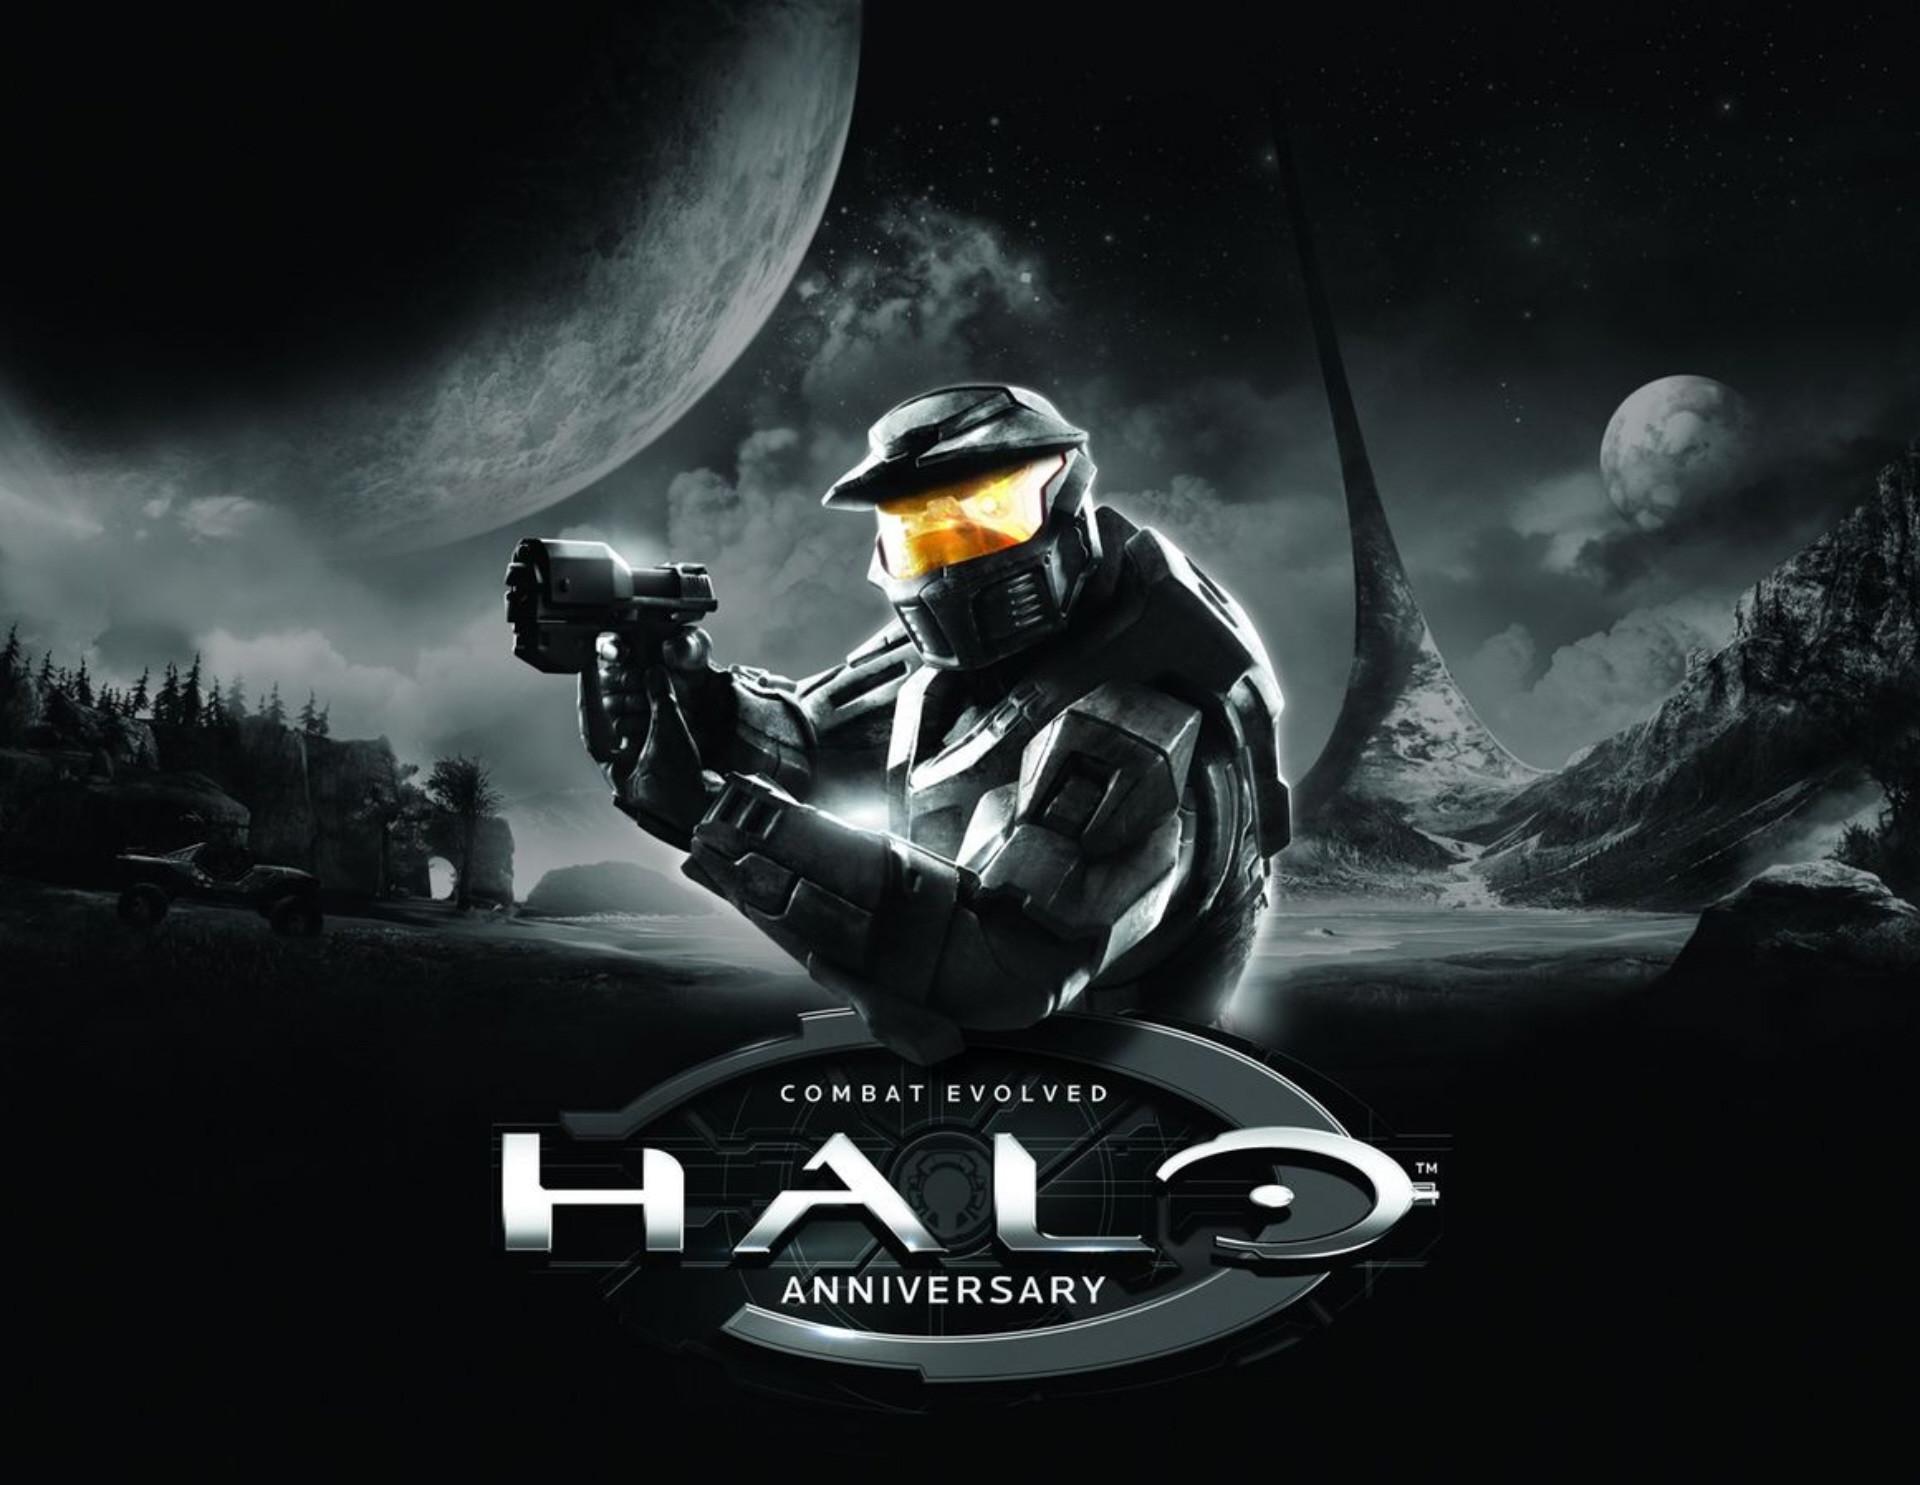 Halo Combat Evolved Wallpaper 77 Images